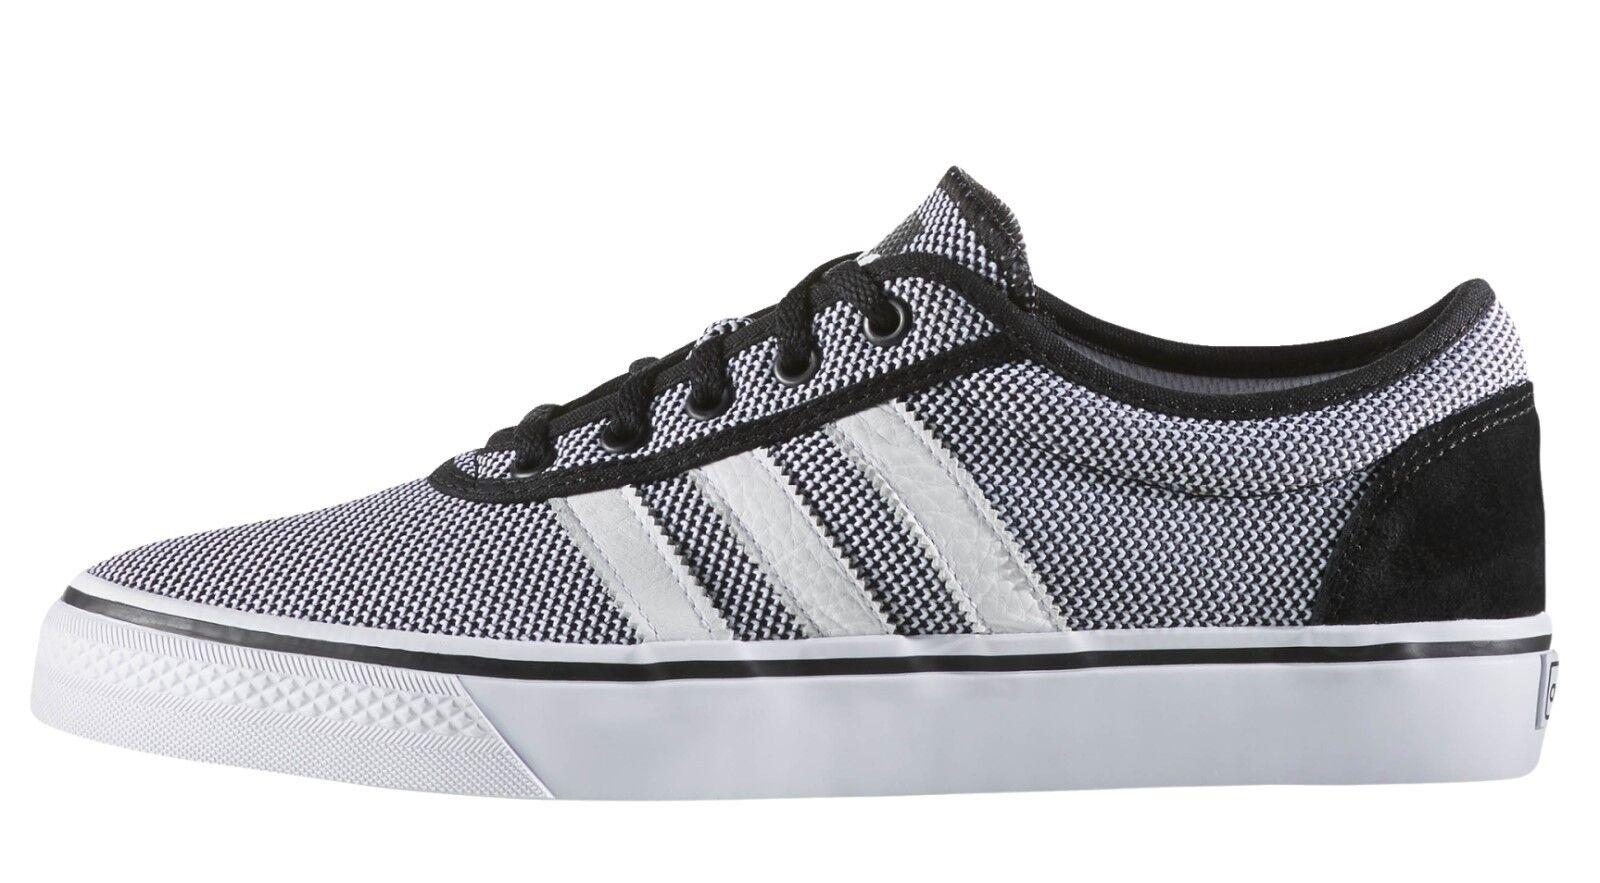 adidas BB8487 ADI-EASE grau Turnschuhe Unisex NEU Skateboarding Schuhe Sneakers